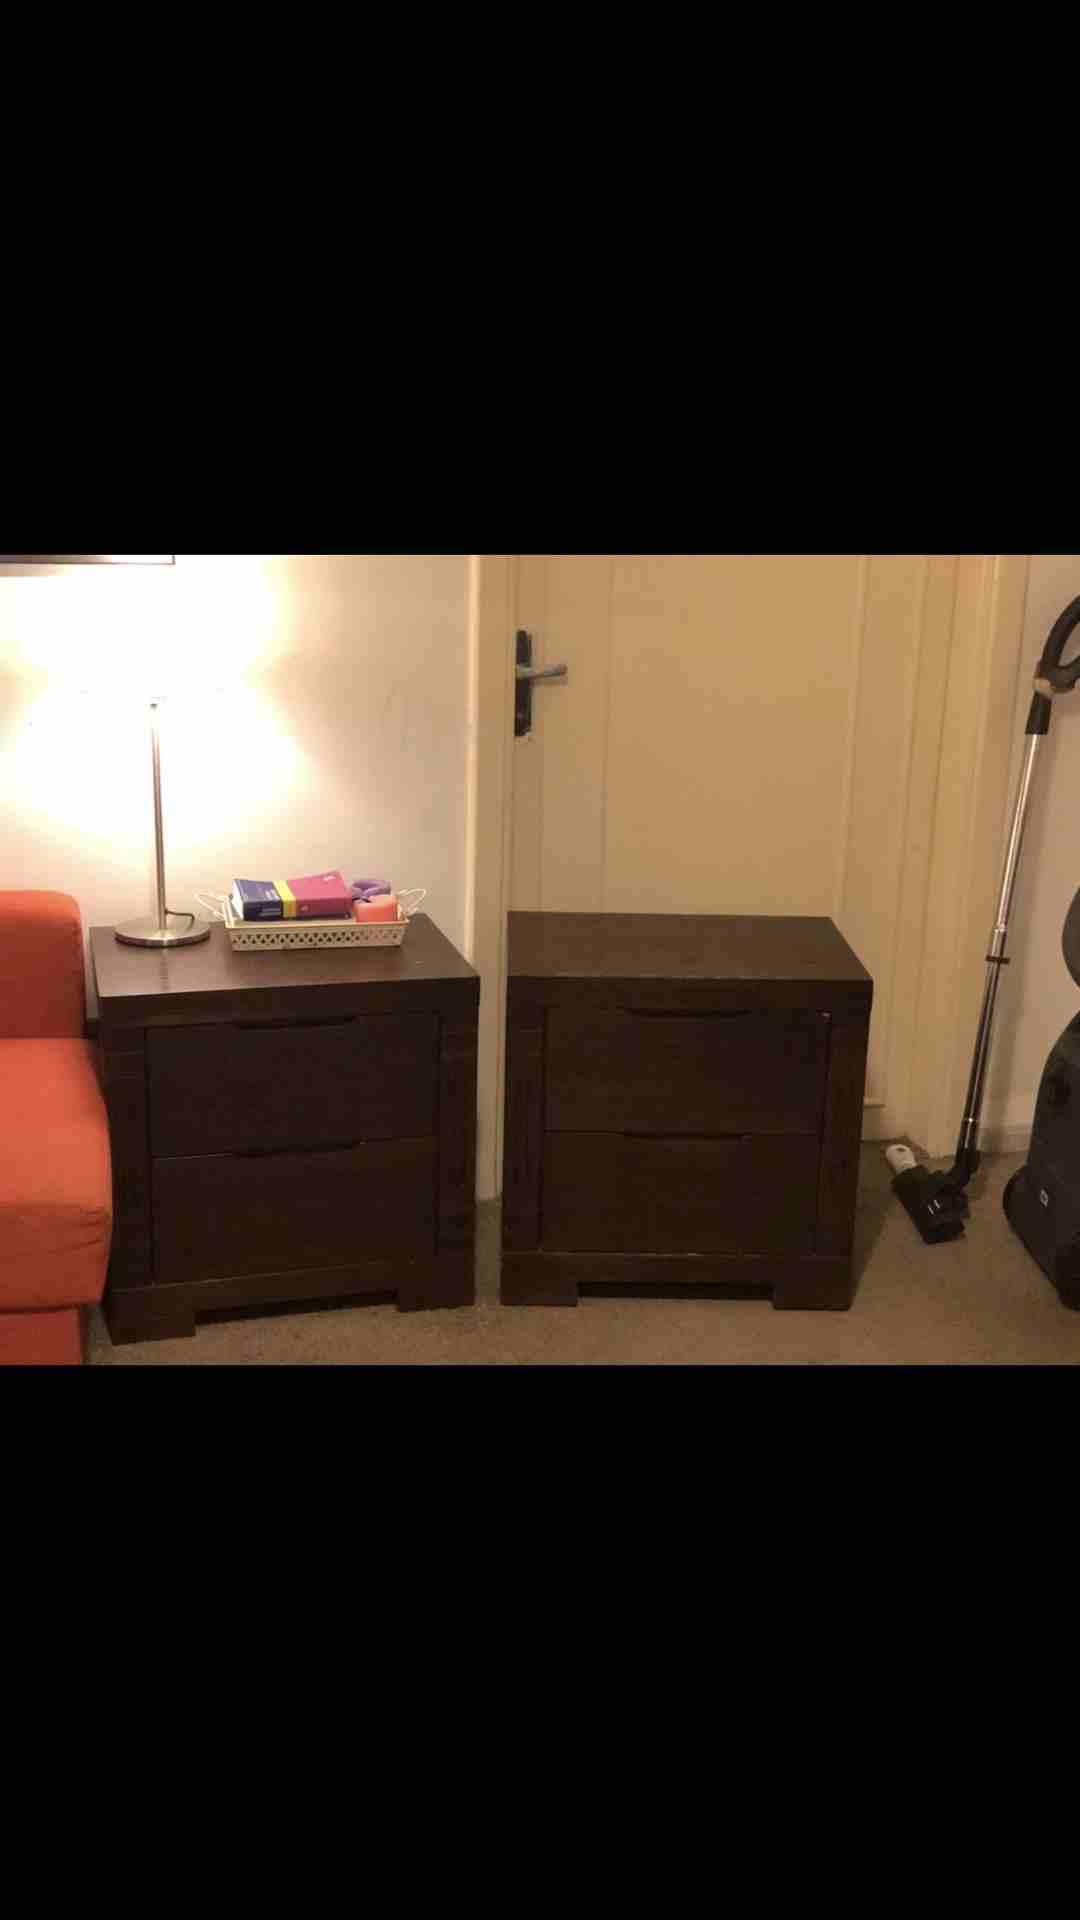 handyman 055-5269352 AL AIN electrical plumbing fixing carpentry split air condition duct air filter gas-  غرفة نوم للبيع كاملة لا...